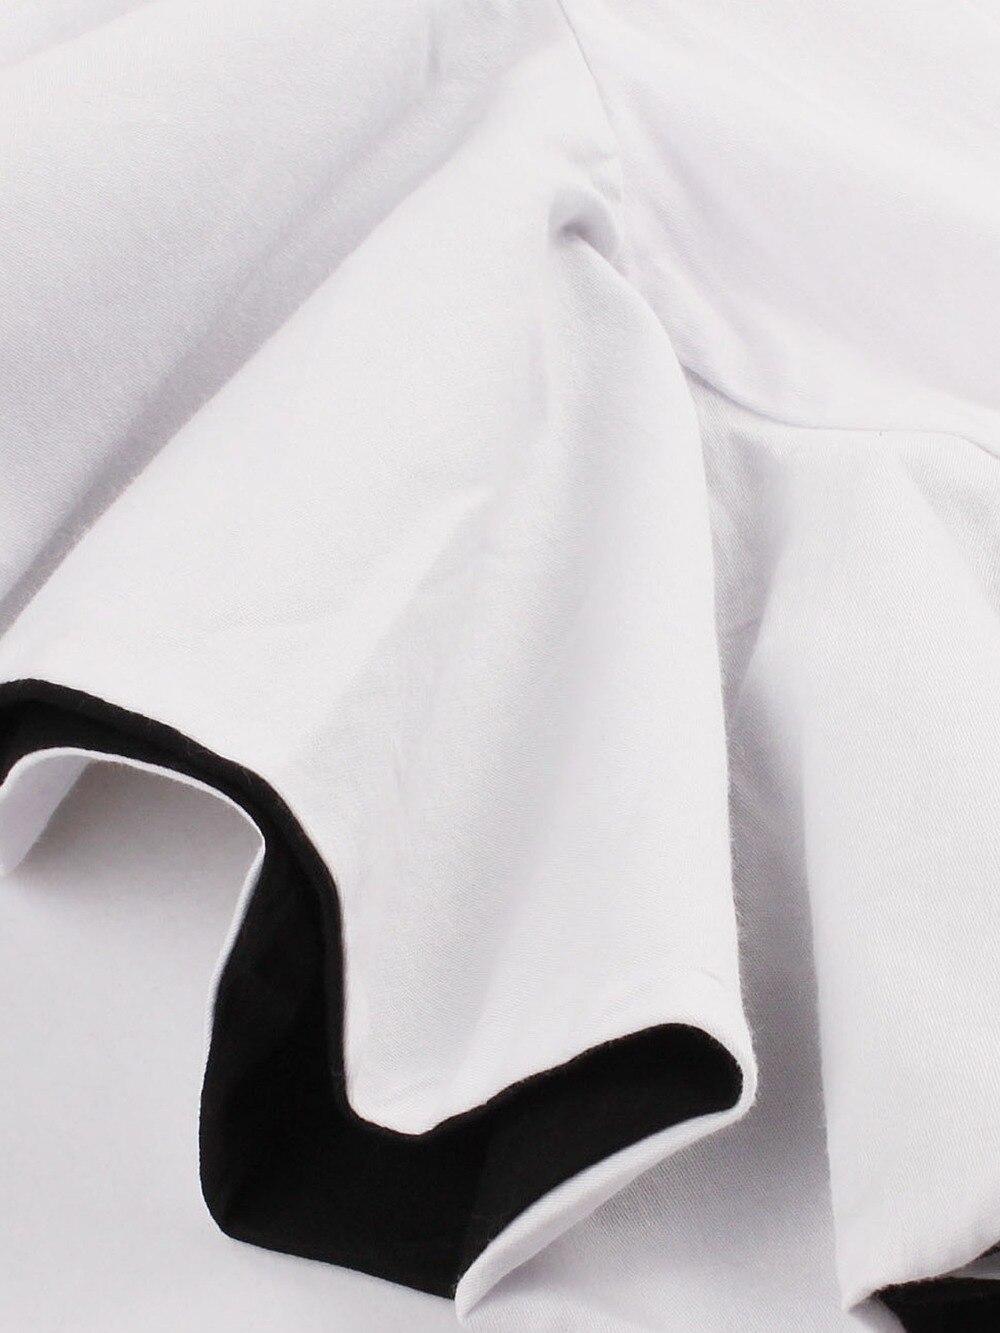 Modstreets Women Summer Dress Slash-Neck White Bodycon Butterfly Sleeve Knee-Length Sheath Solid Cotton Regular Female Dress